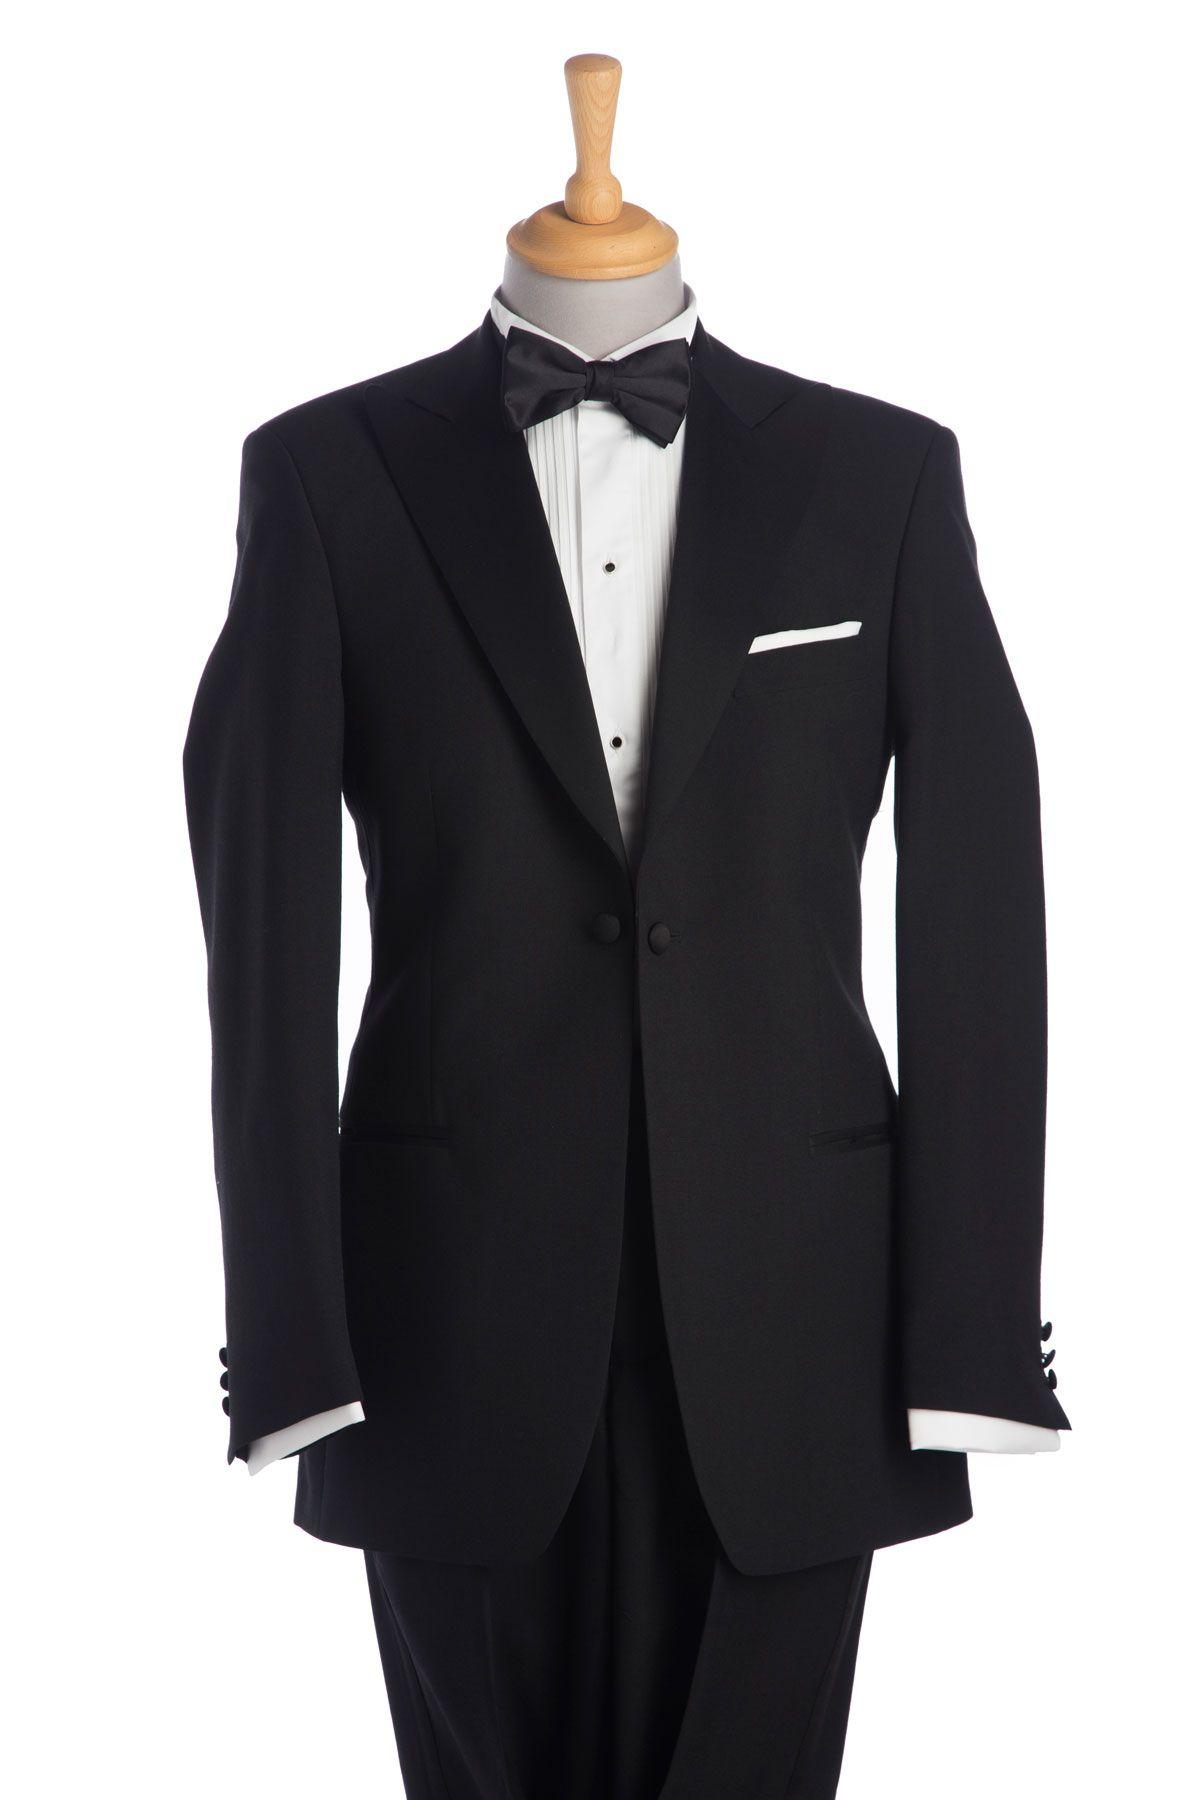 17d7a52202f Black Peak Lapel Tuxedo – Gowri Style House